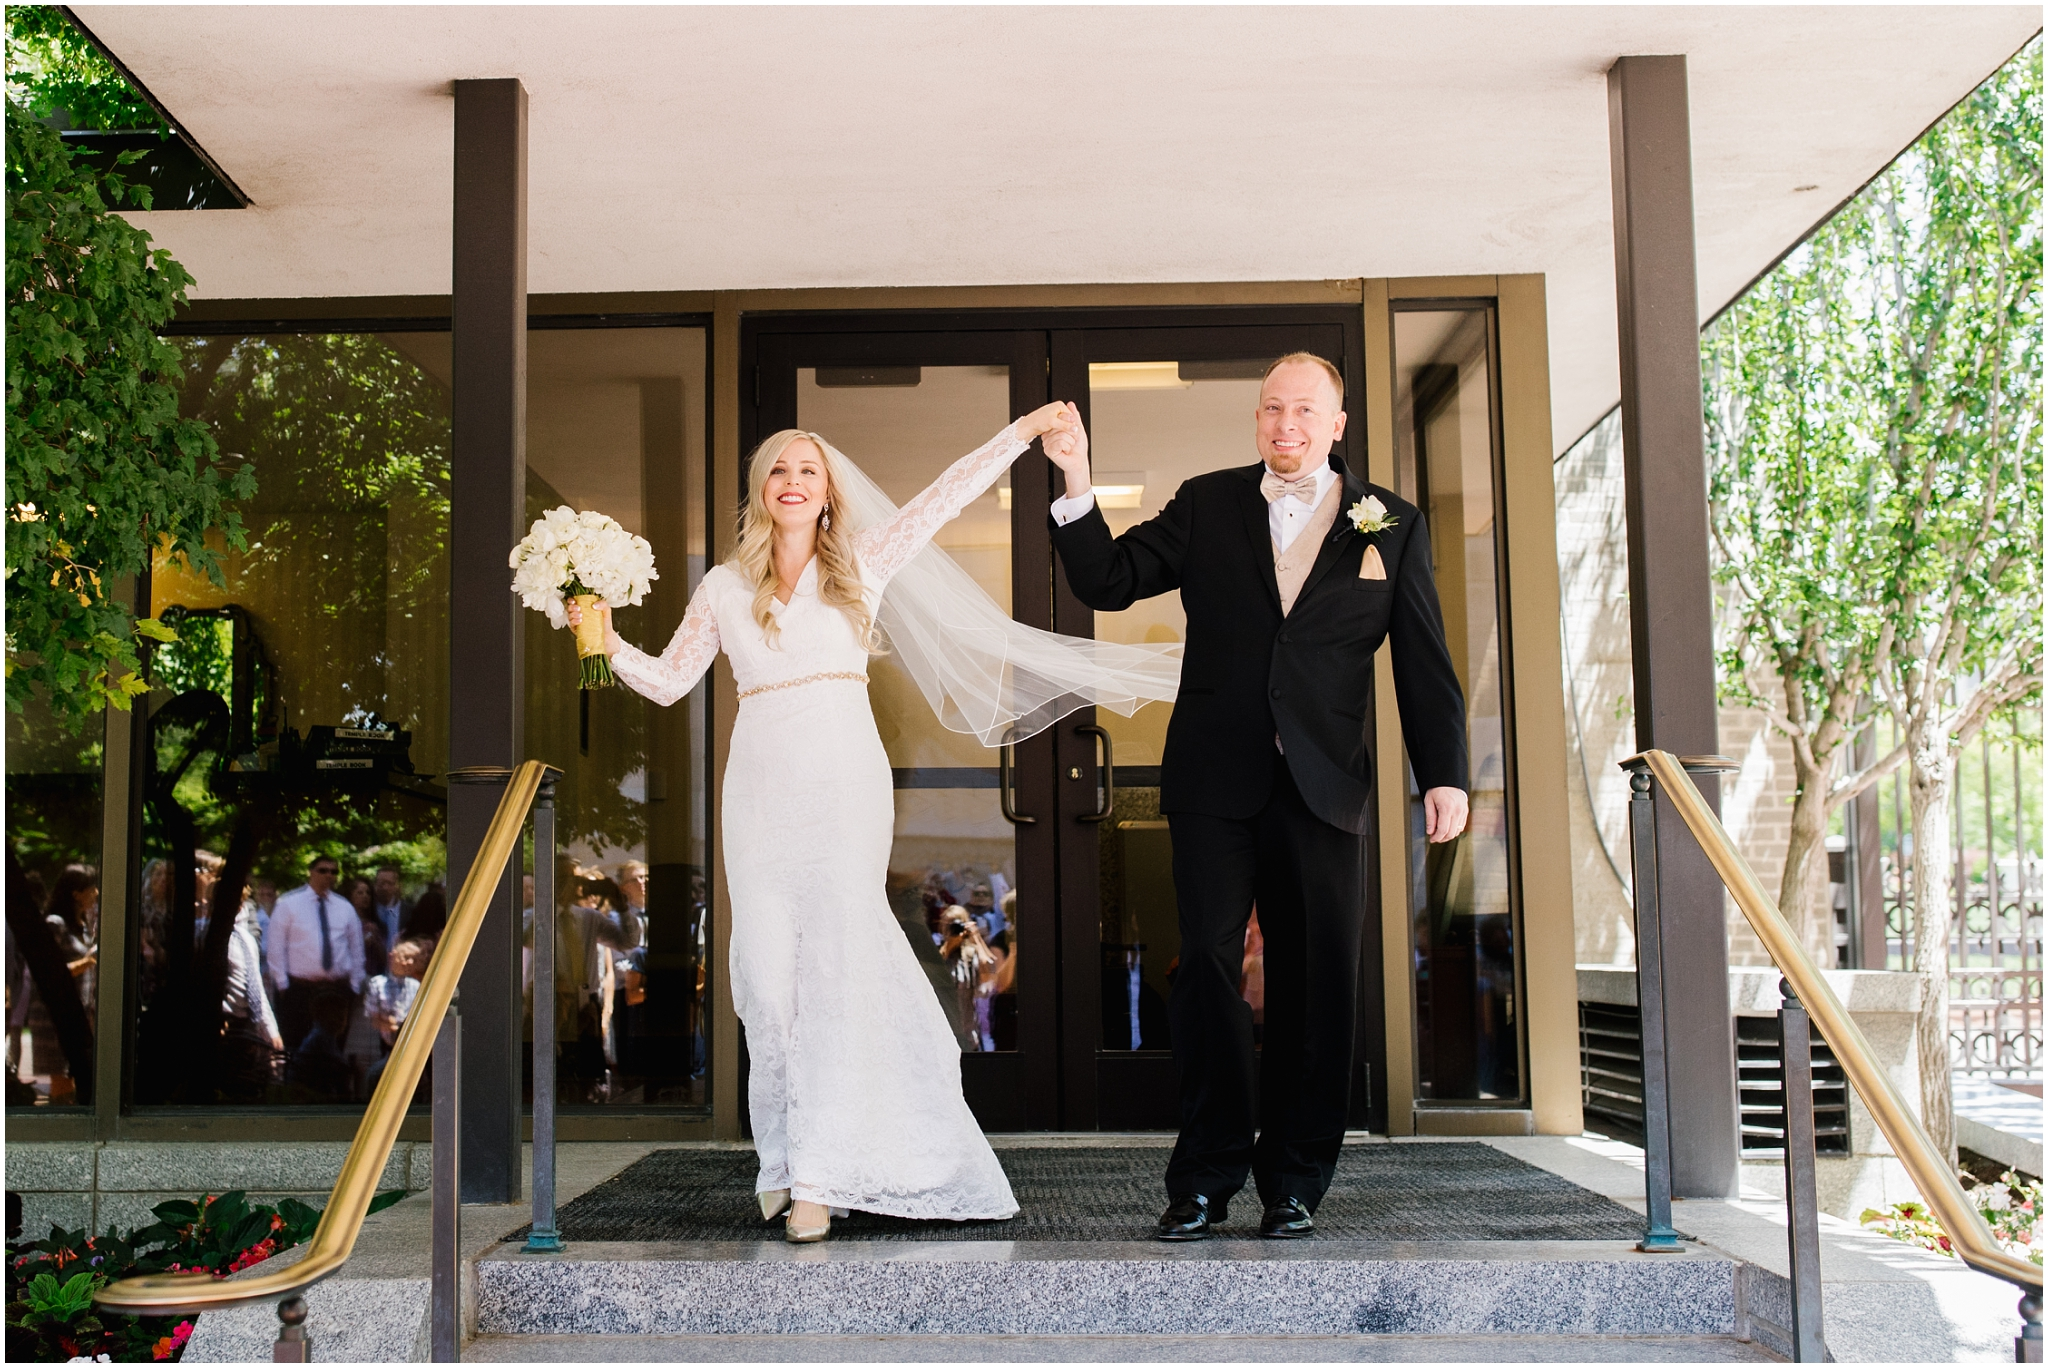 CherylandTyler-2_Lizzie-B-Imagery-Utah-Wedding-Photographer-Salt-Lake-City-Temple-Wells-Fargo-Building-Reception.jpg